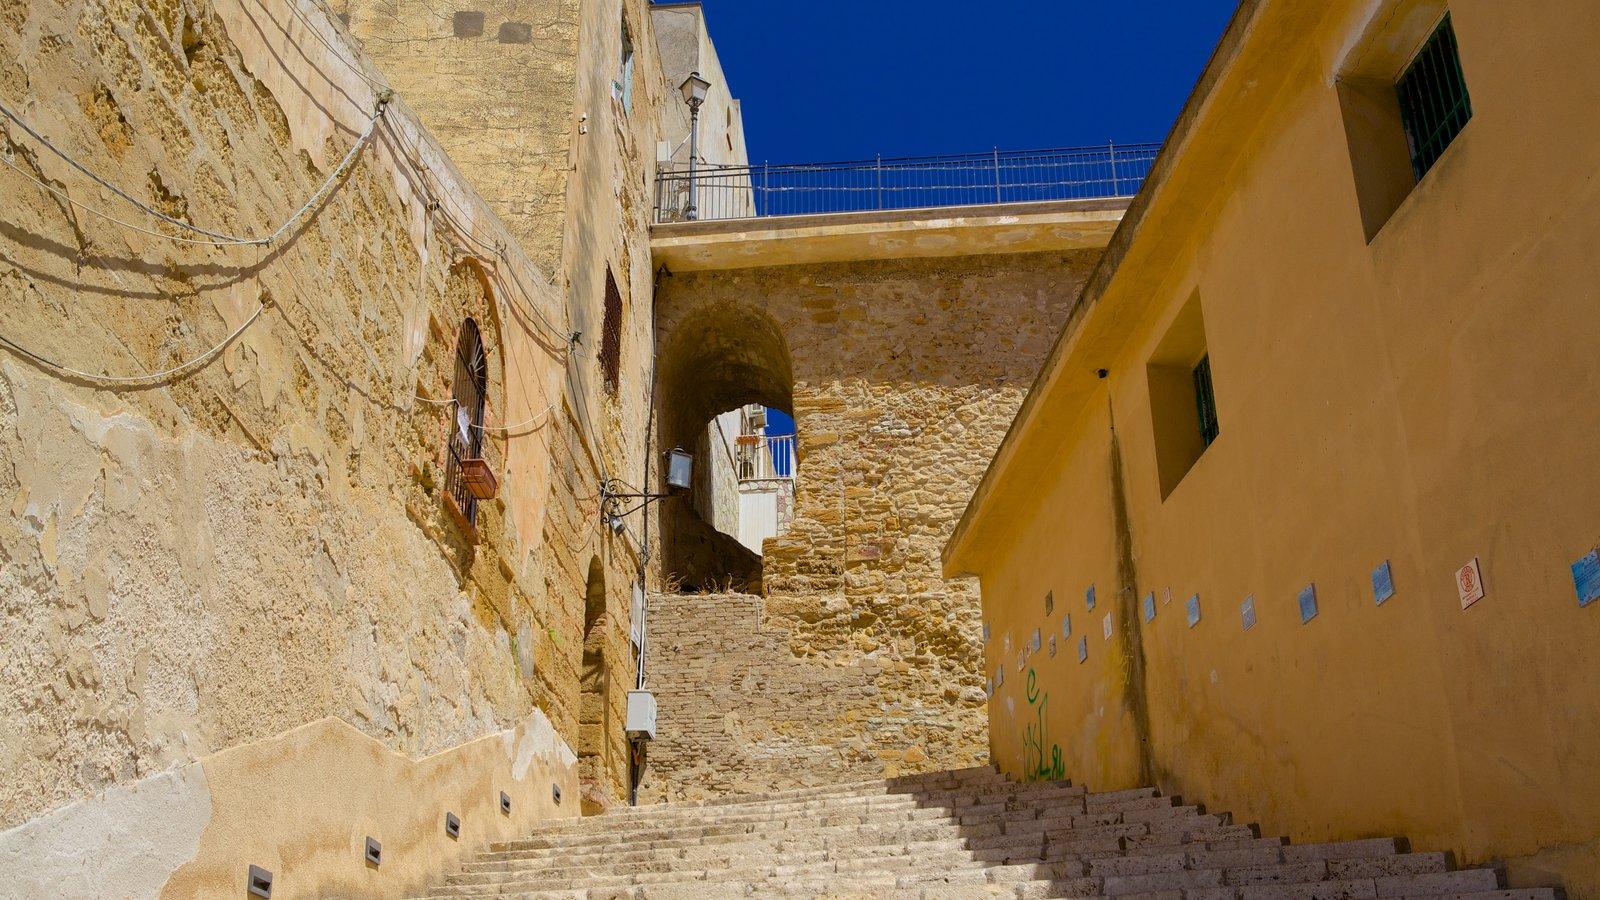 Castellammare del Golfo que inclui um castelo e elementos de patrimônio